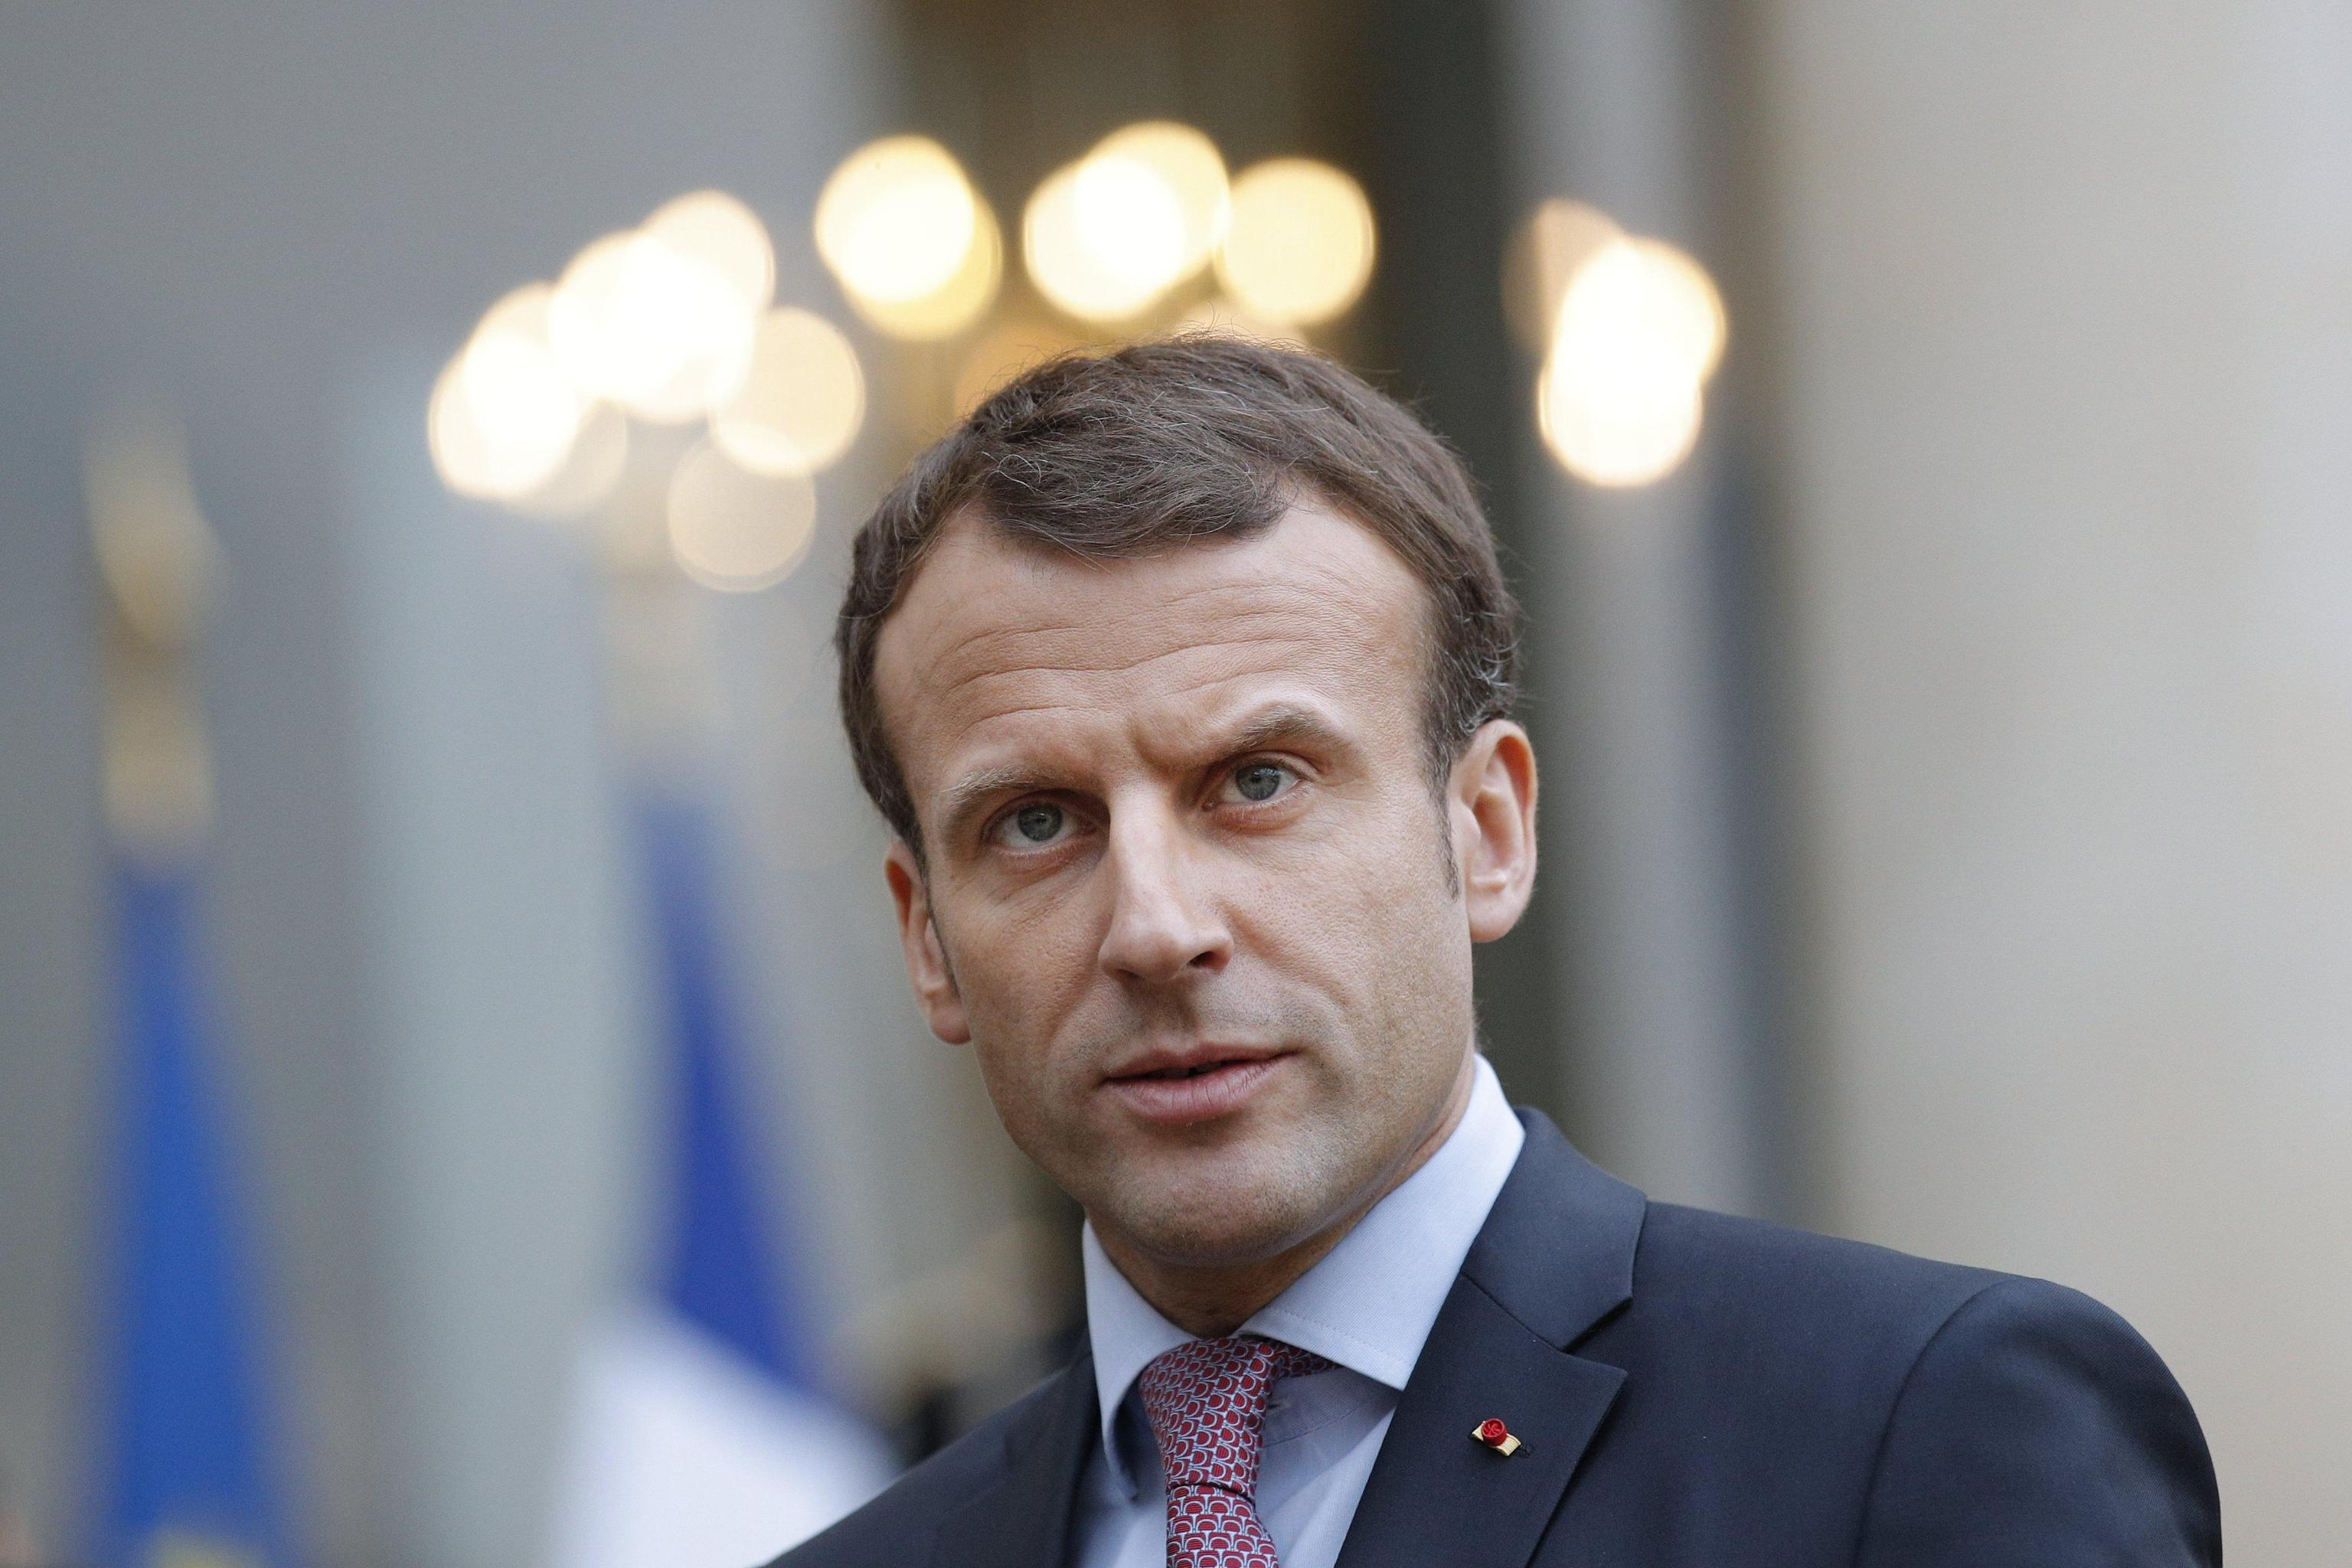 Gerusalemme: appello Macron per 'calma'